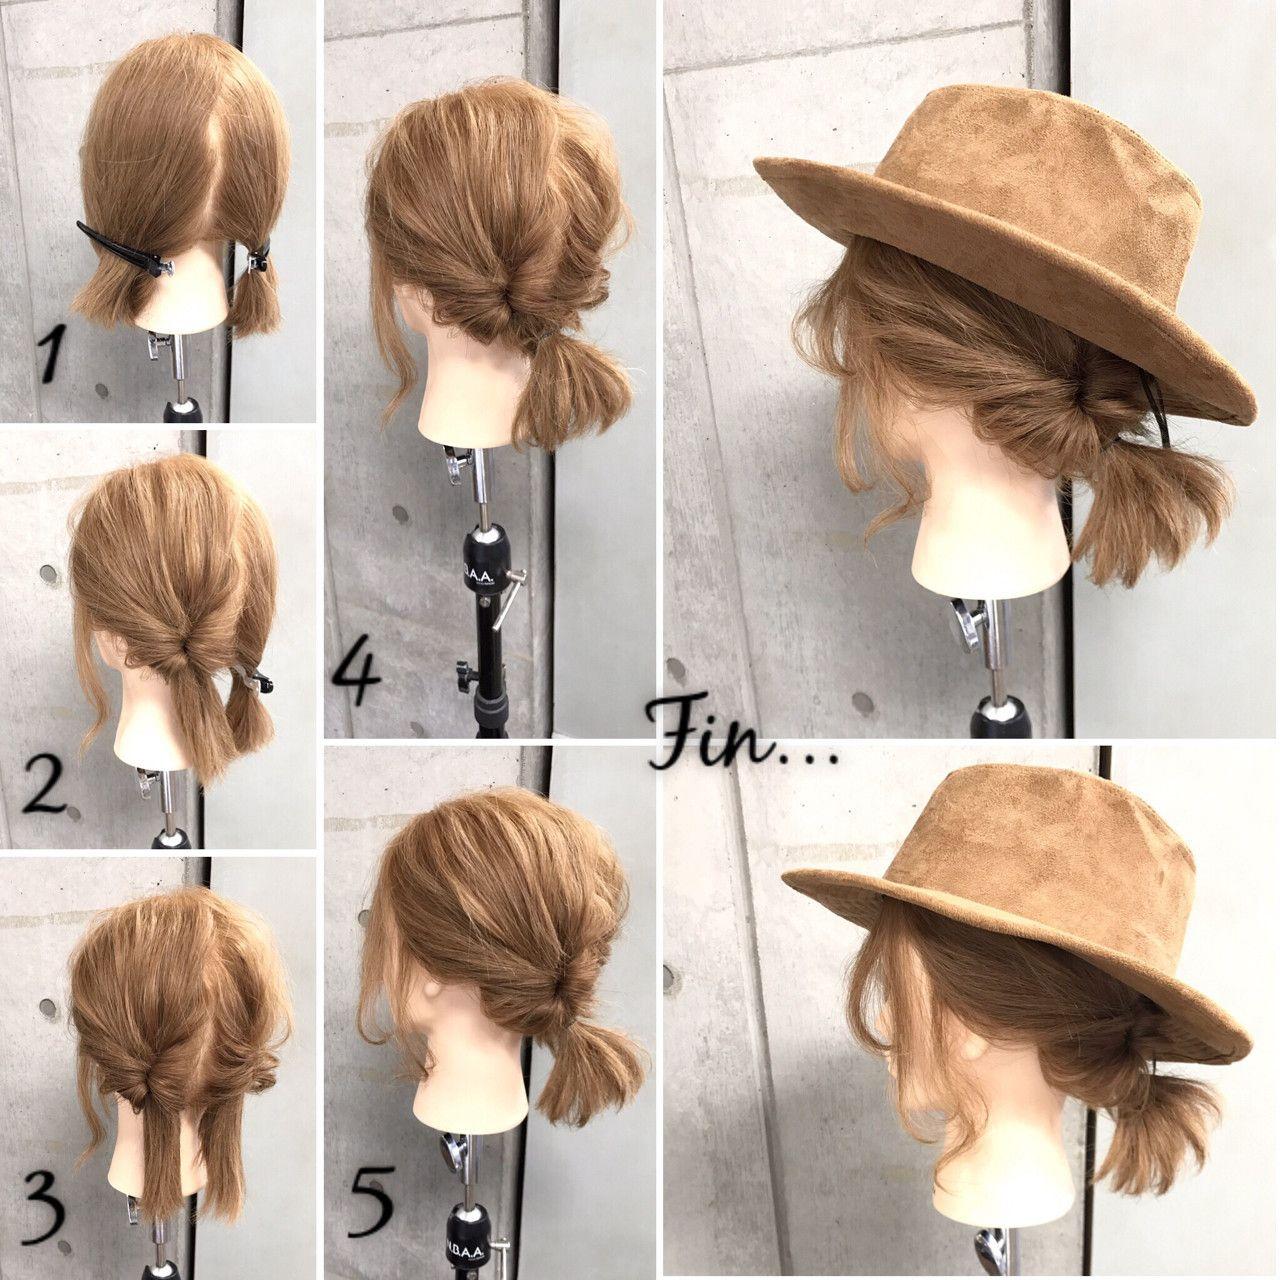 Hair おしゃれまとめの人気アイデア Pinterest Catz ヘアスタイリング